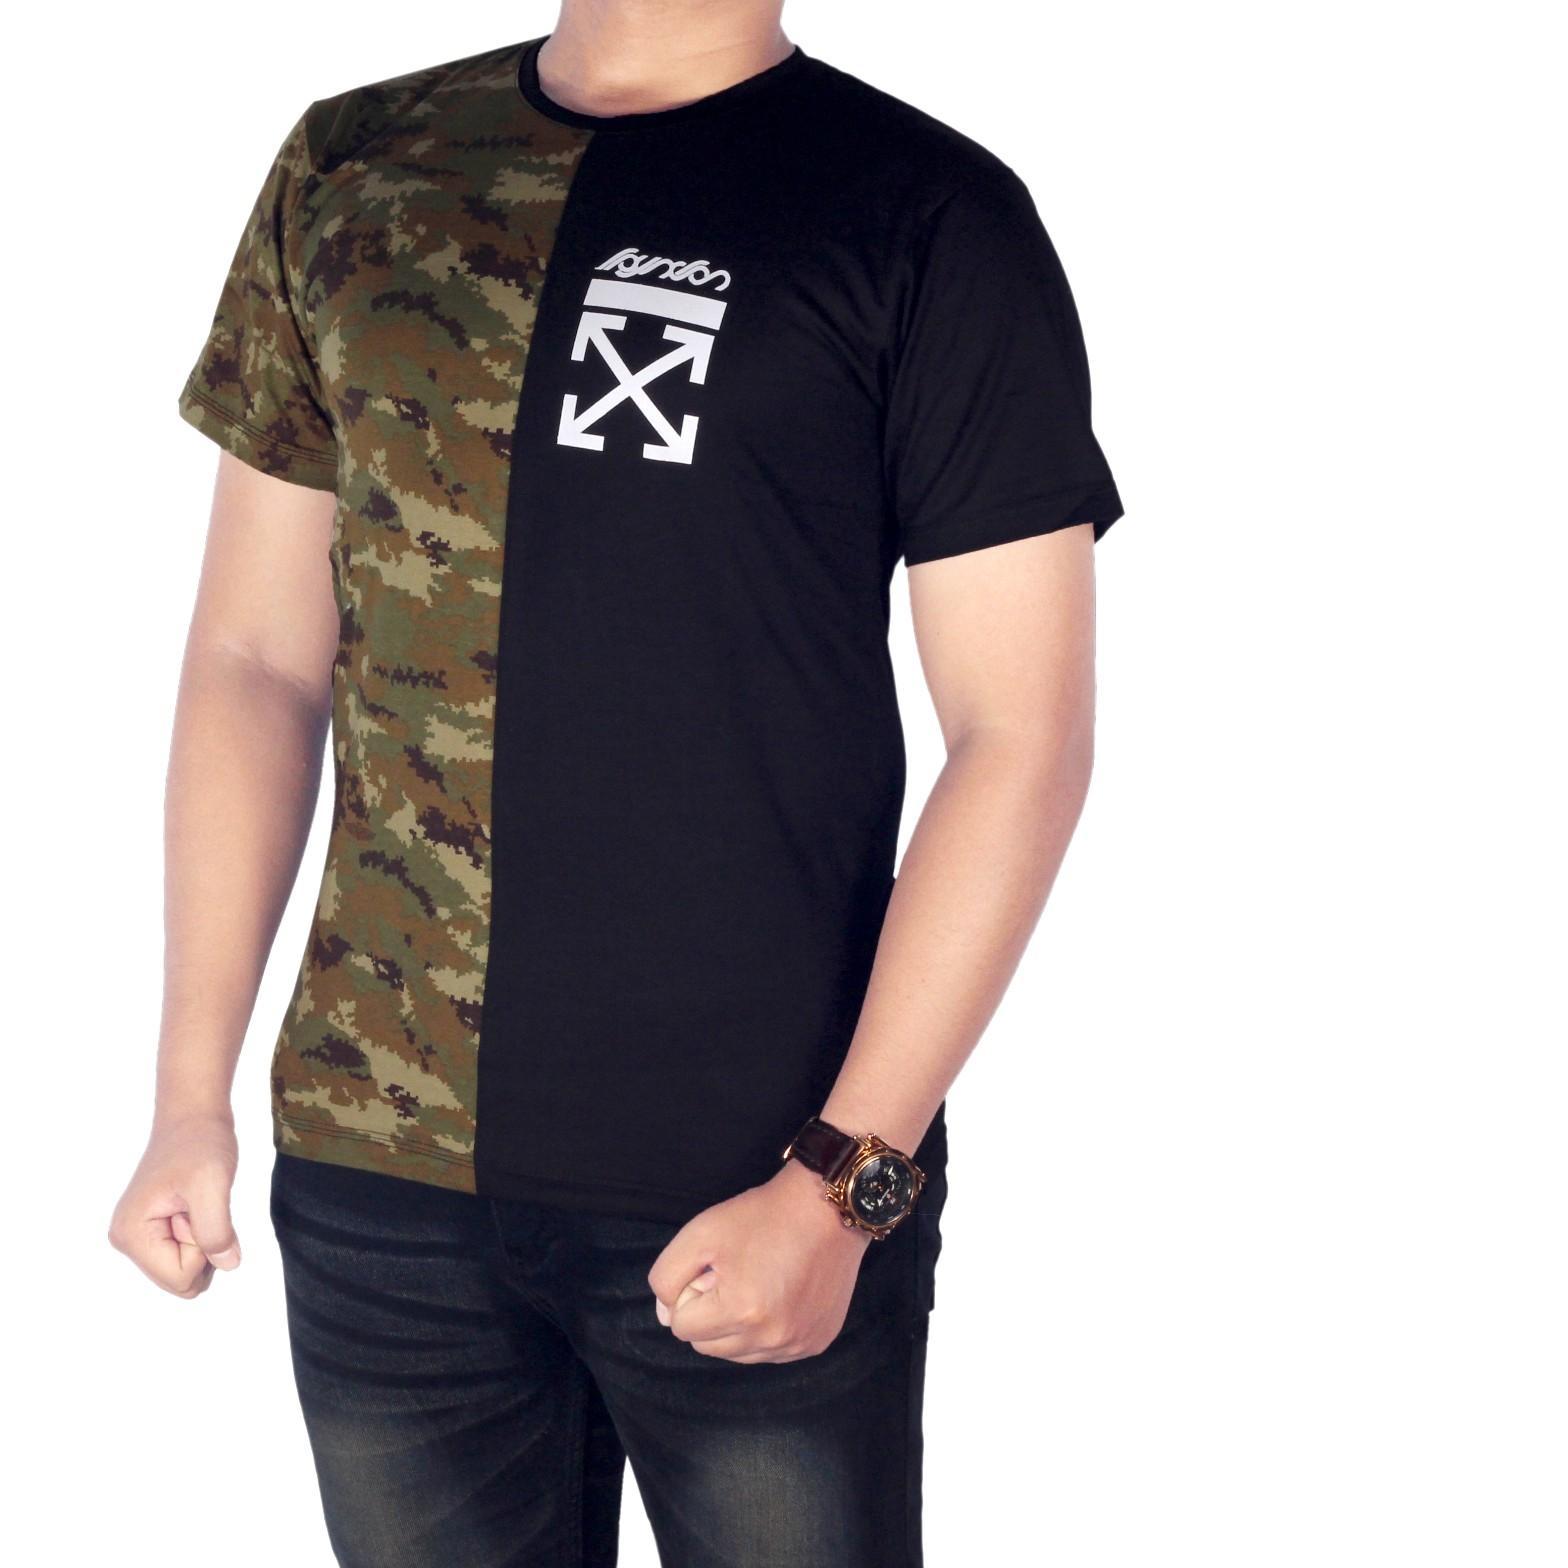 Dgm_Fashion1 Kaos Distro Hitam Combinasi Army / Baju Kaos Distro Hitam Polos/ Kaos Anak Motor/Kaos Retro/ Kaos Hitam Polos/Baju YOUNG LEX/Kaos Polos/Kaos Oblong/Kaos Distro/Kaos Casual/Kaos Hitam/Kaos Raglan/T-Shirt Man NX 5636